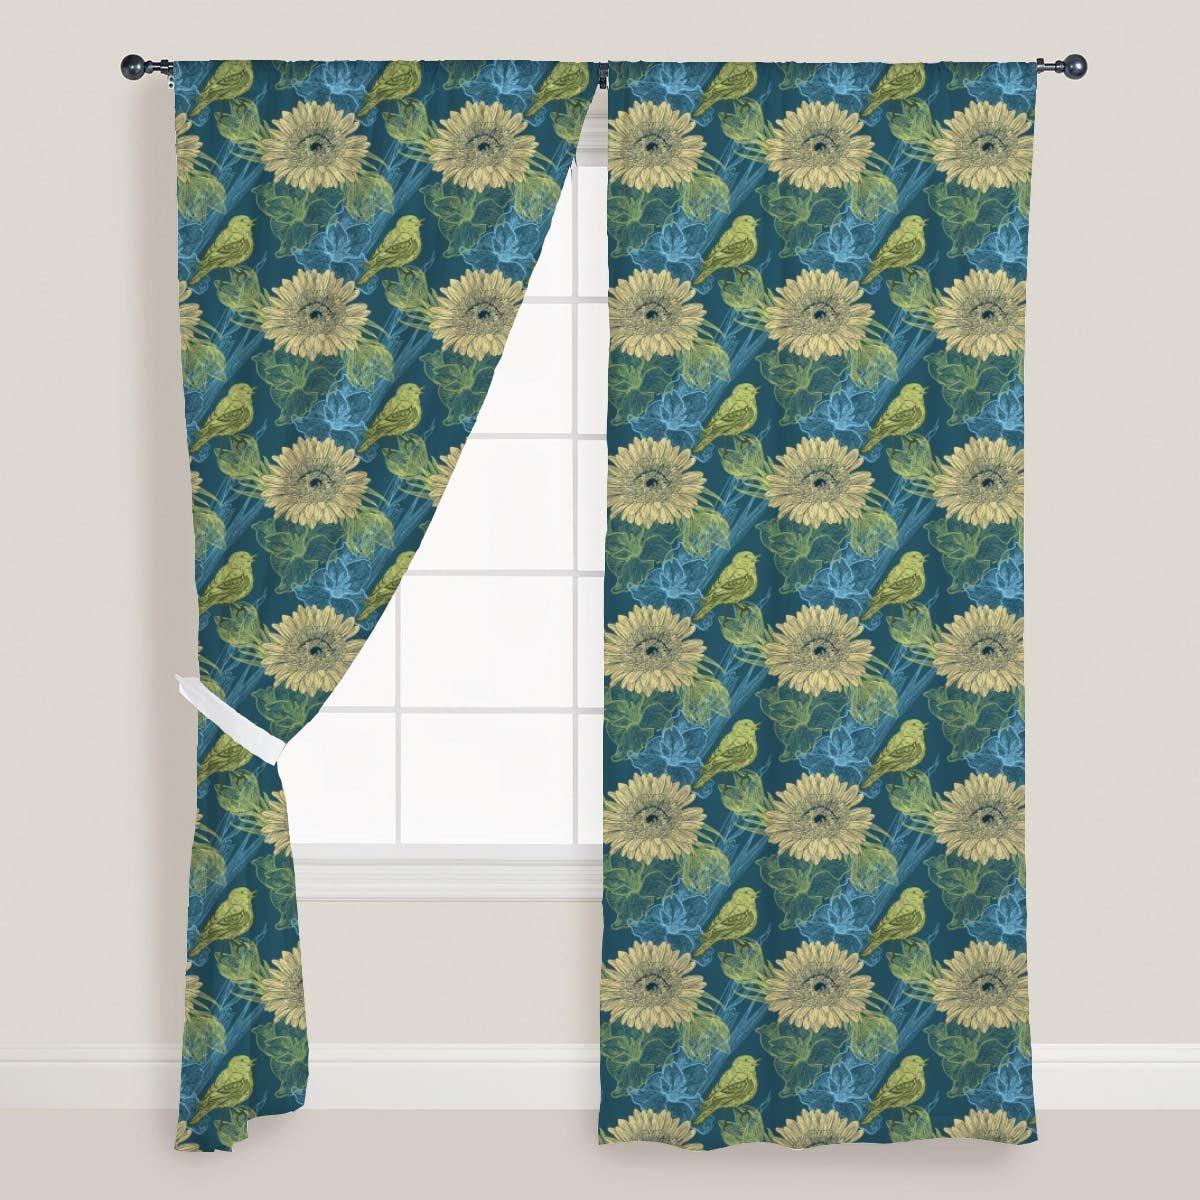 AZ Handdrawn Birds Door & Window Curtain Satin 4feet x 11feet; SET OF 3 PCS